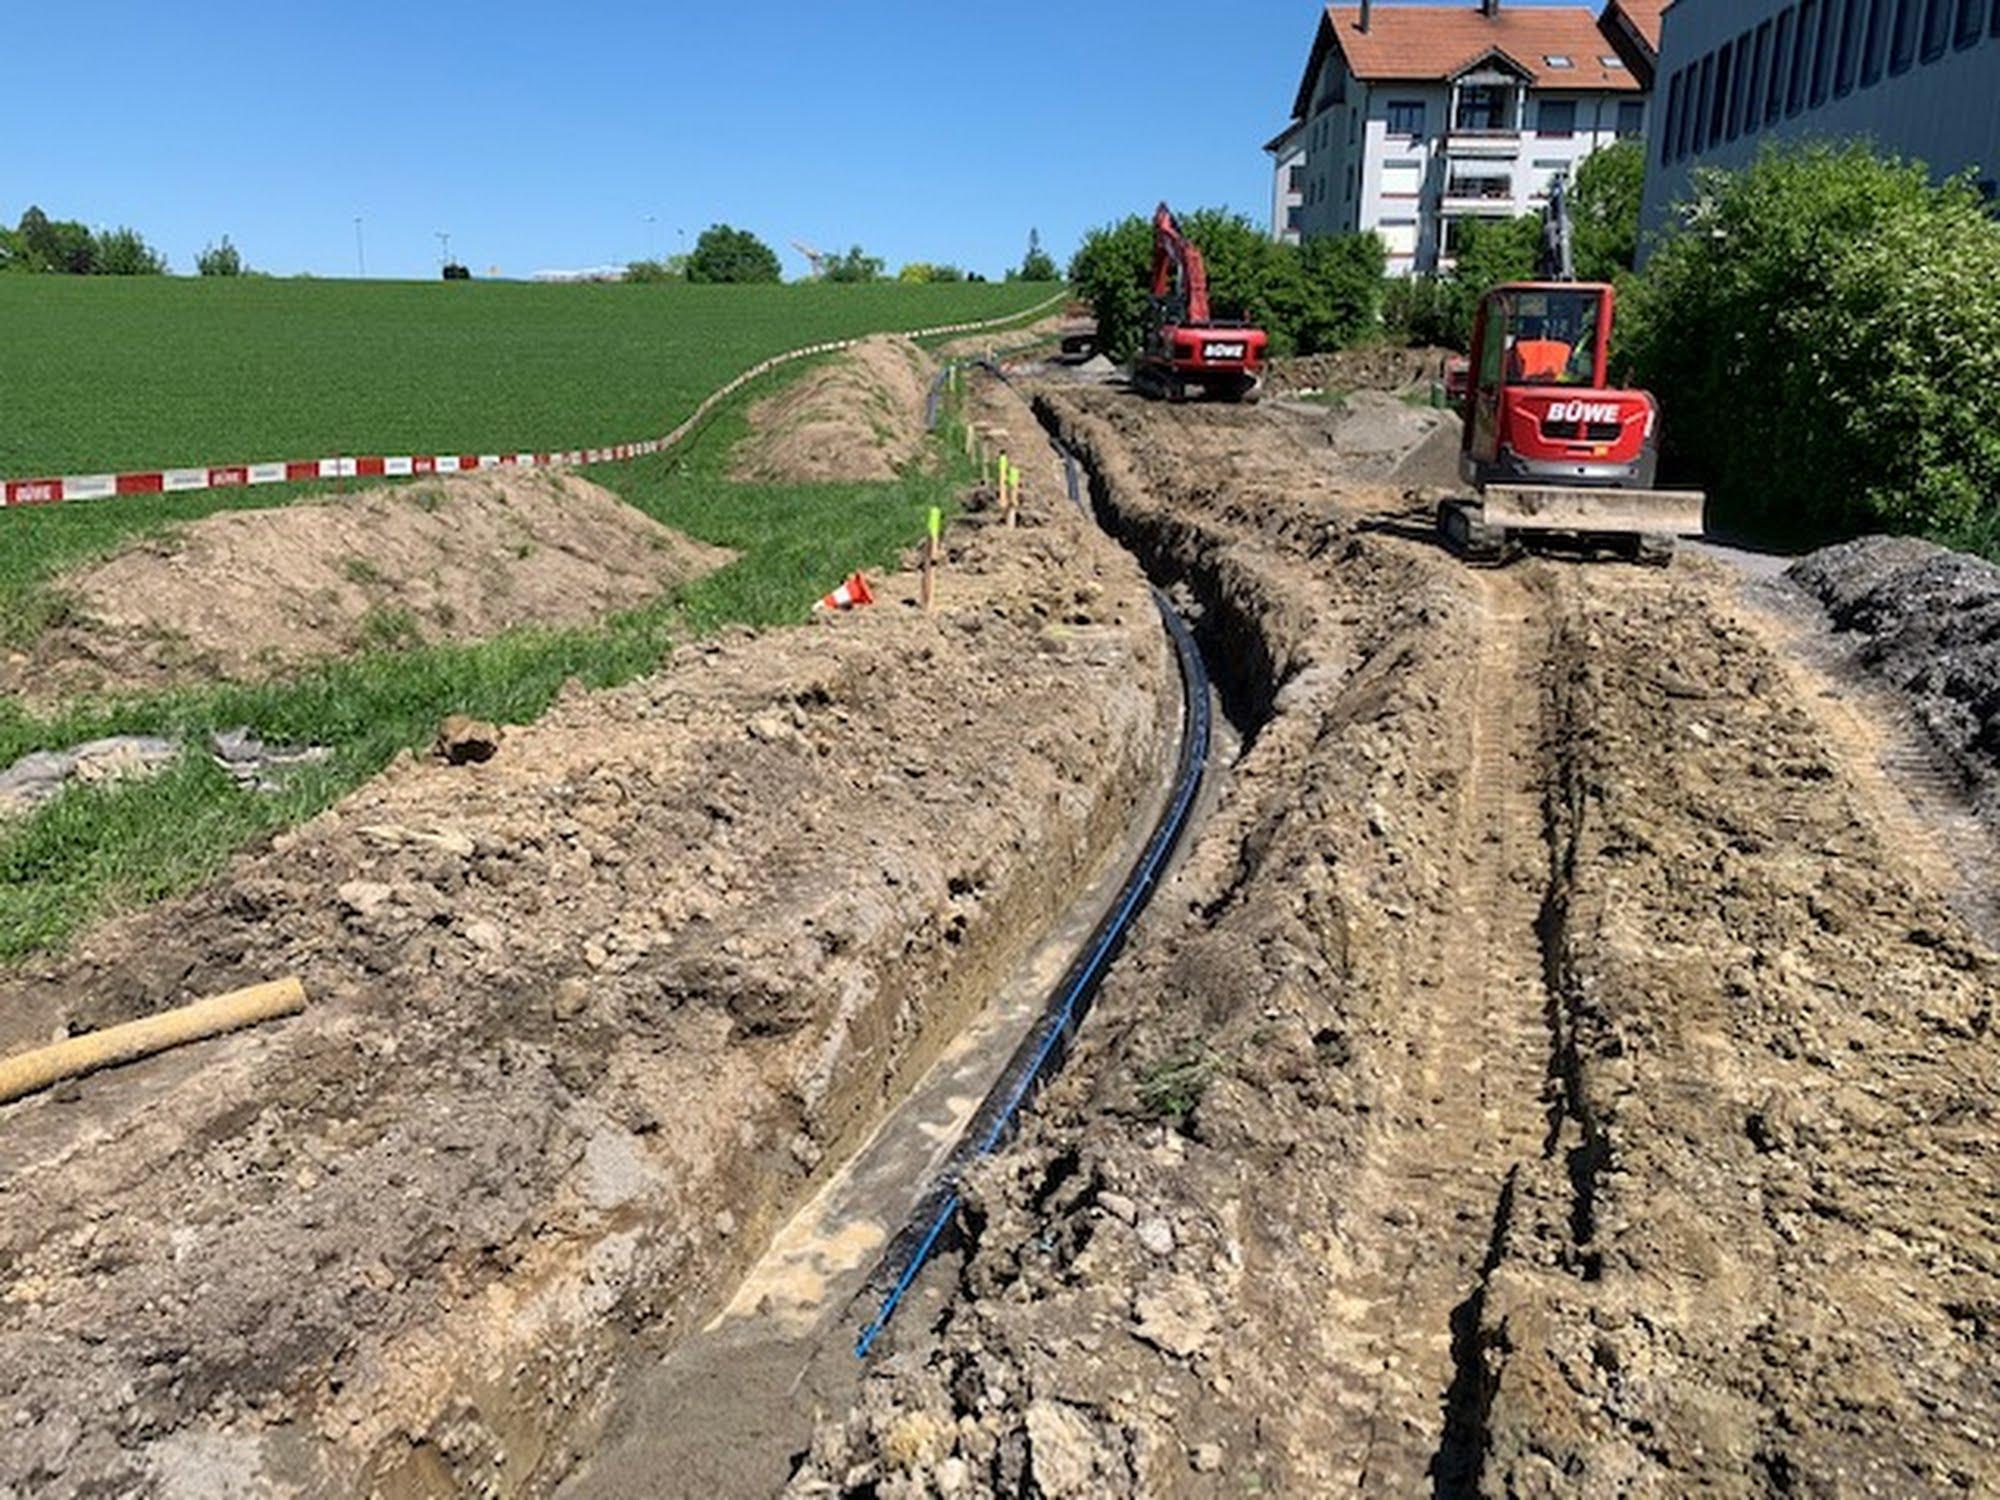 Fuss- & Radweg Kirchbühl